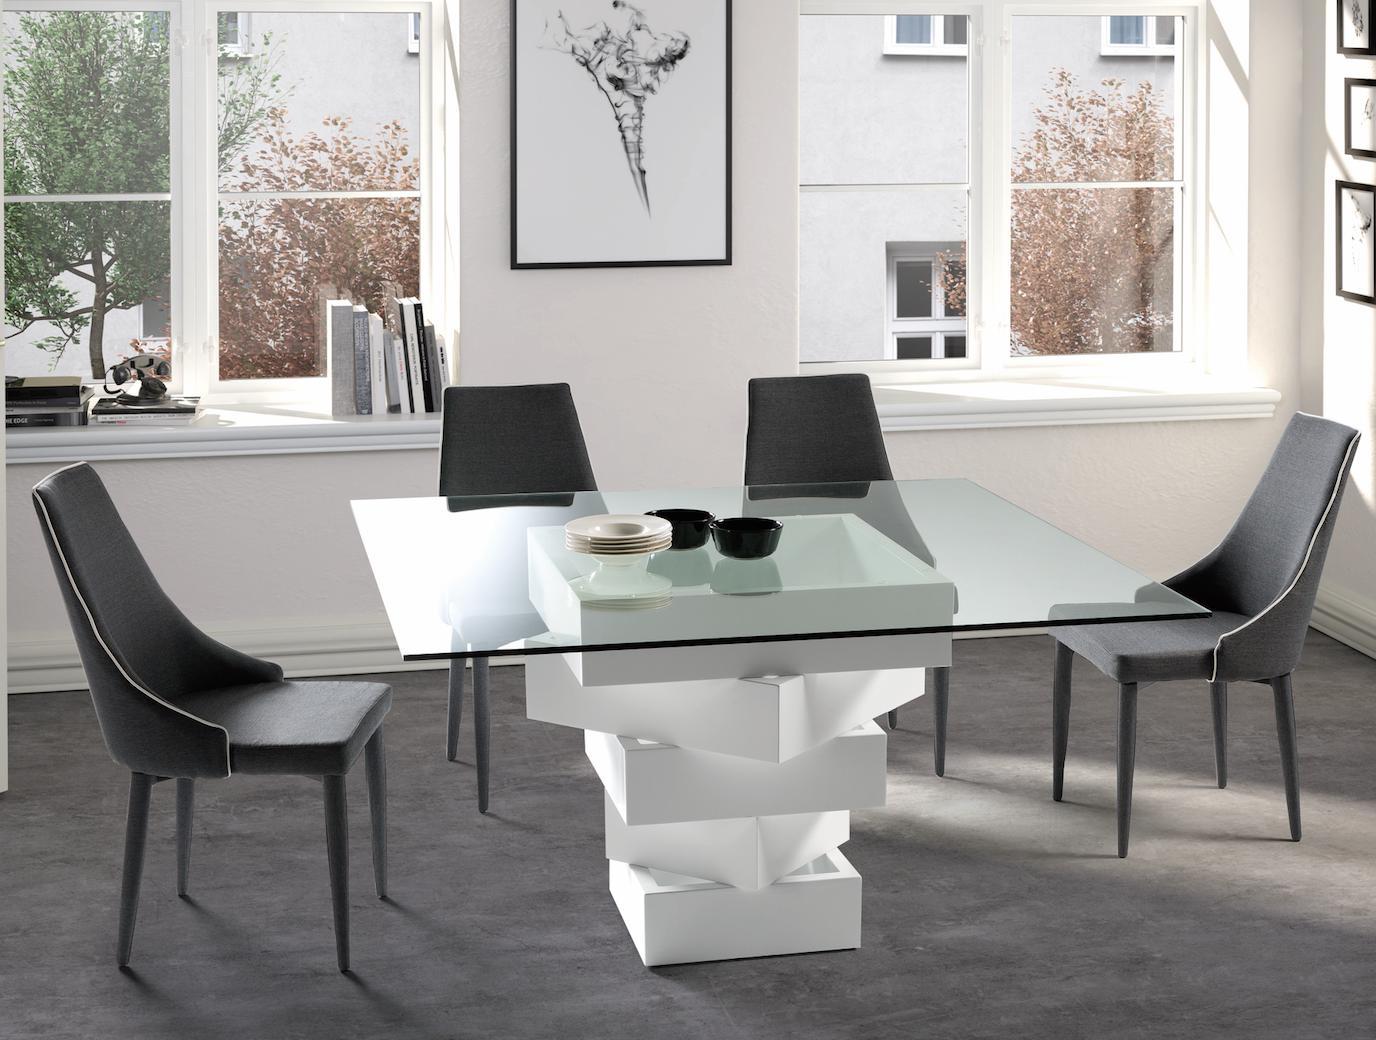 table manger carr e bois laqu blanc et verre kaz. Black Bedroom Furniture Sets. Home Design Ideas